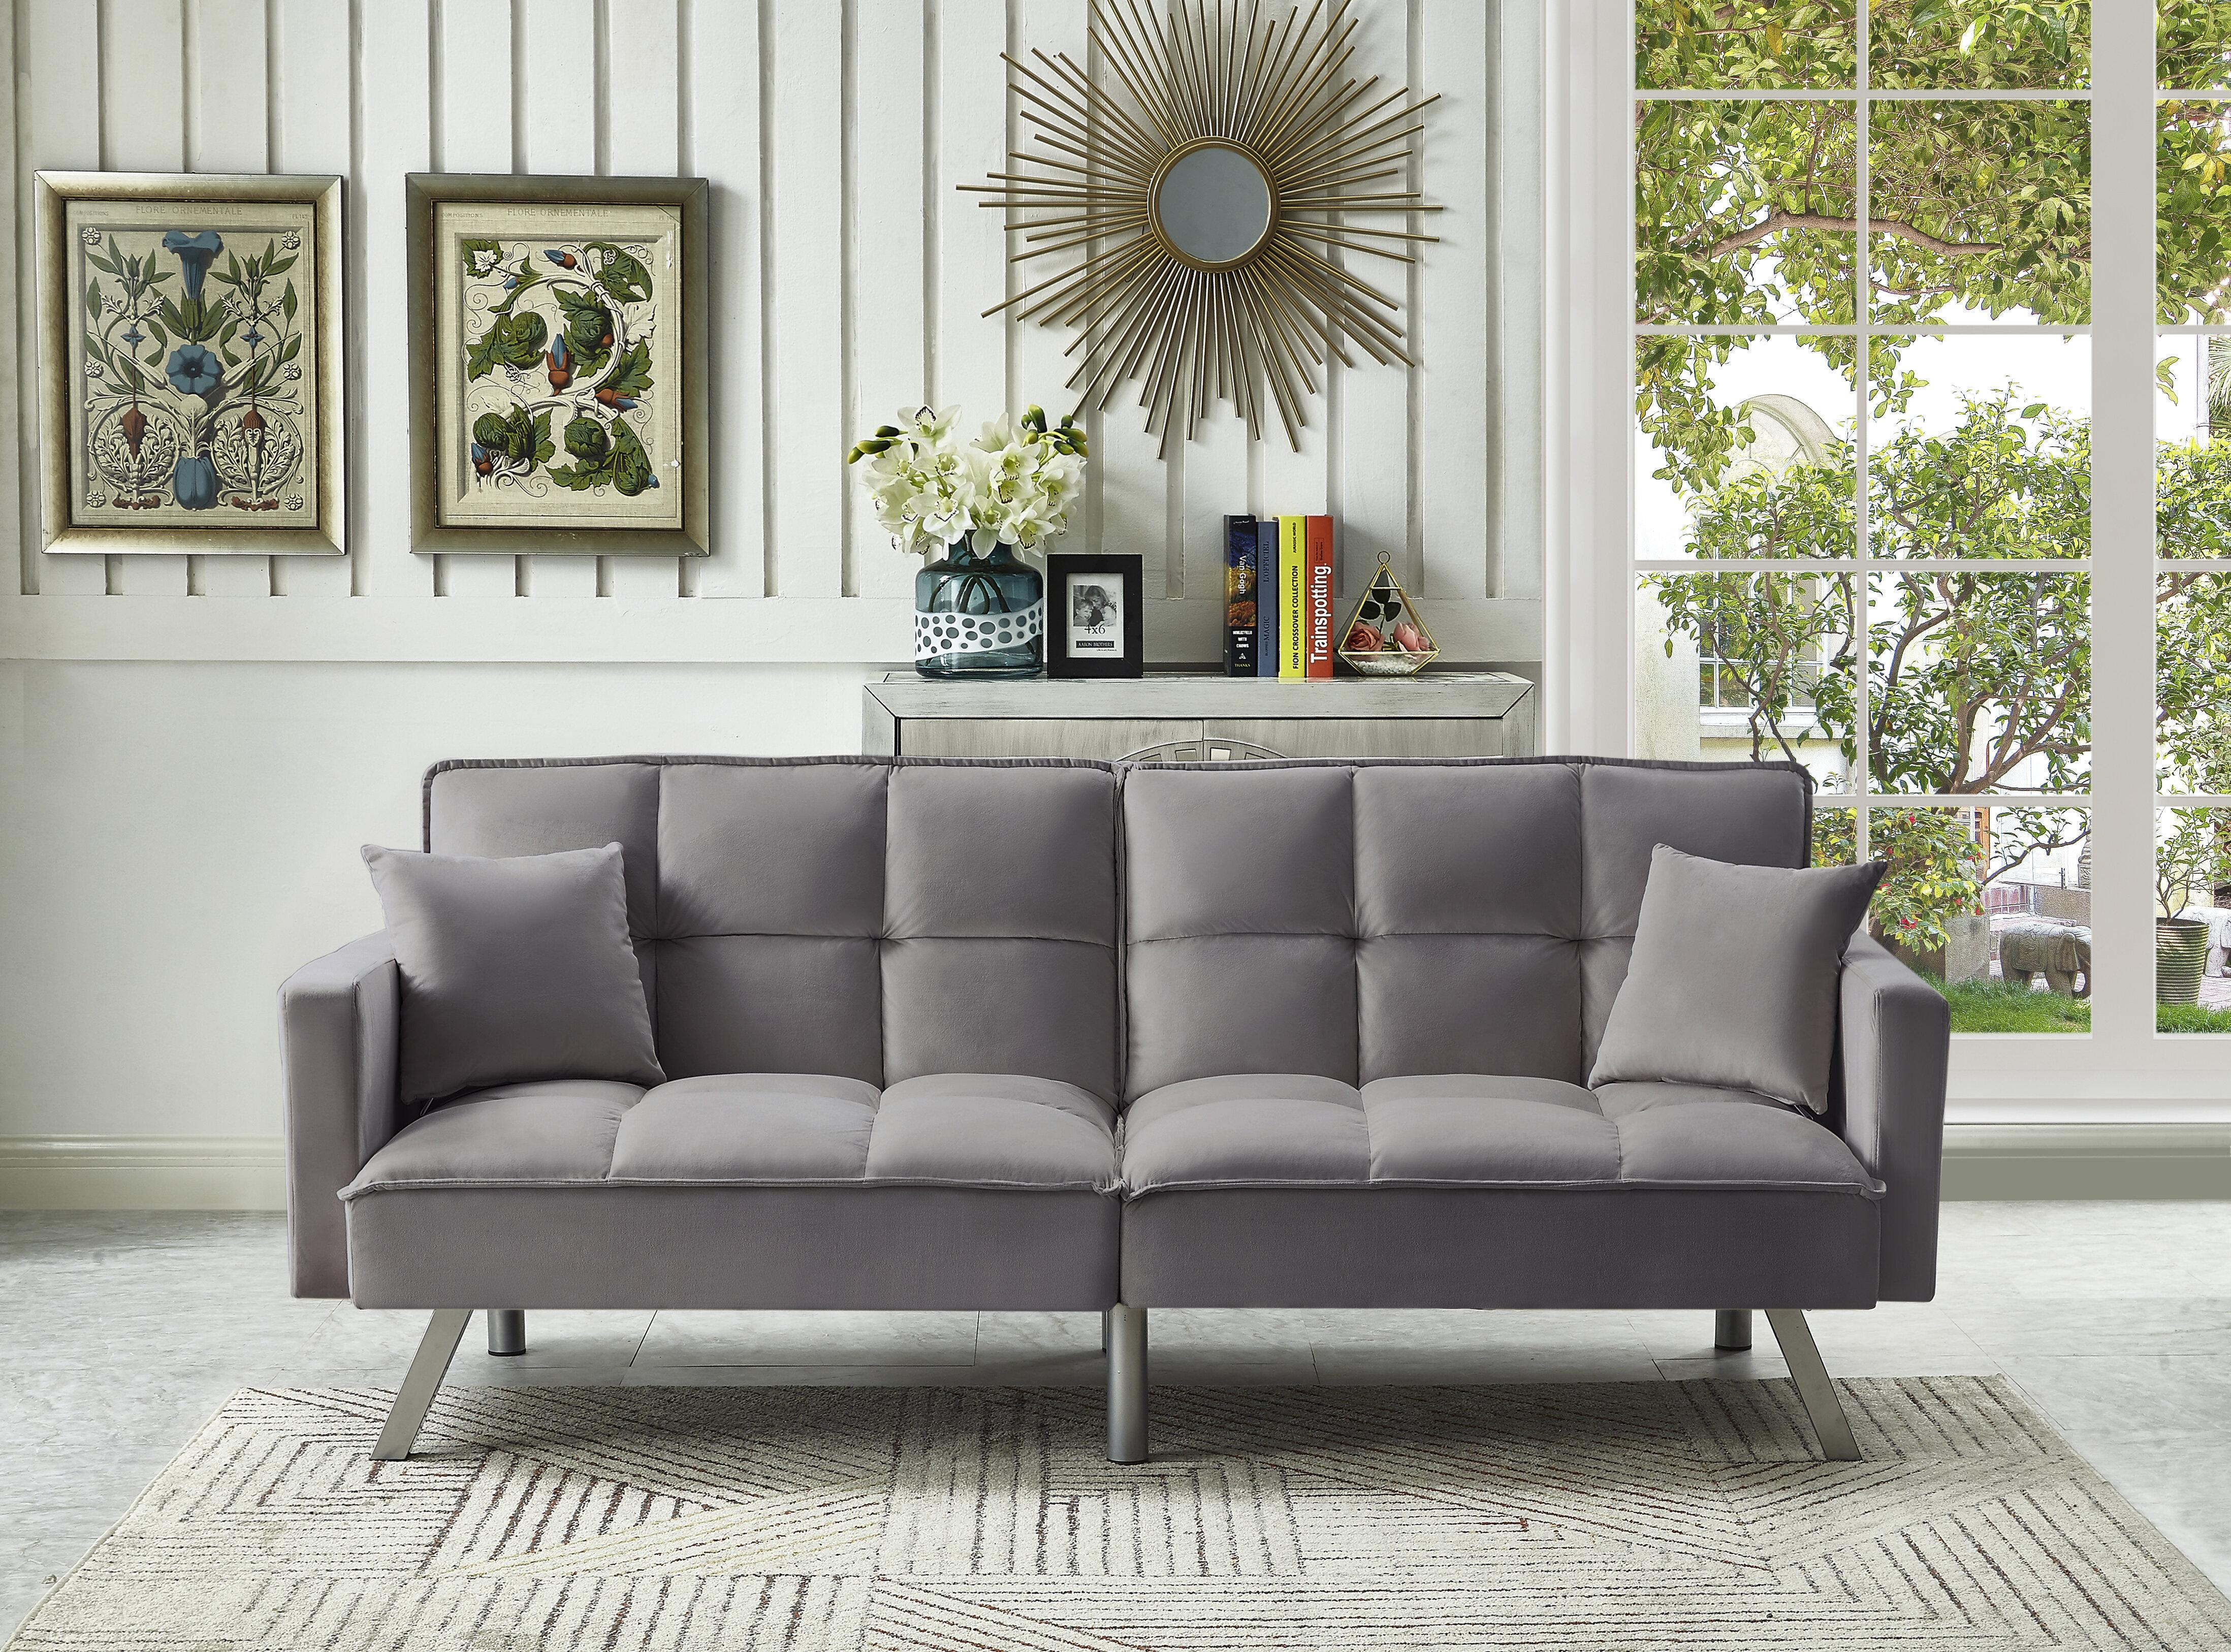 Mercer41 Brackin Twin Or Smaller Split Back Convertible Sofa Reviews Wayfair